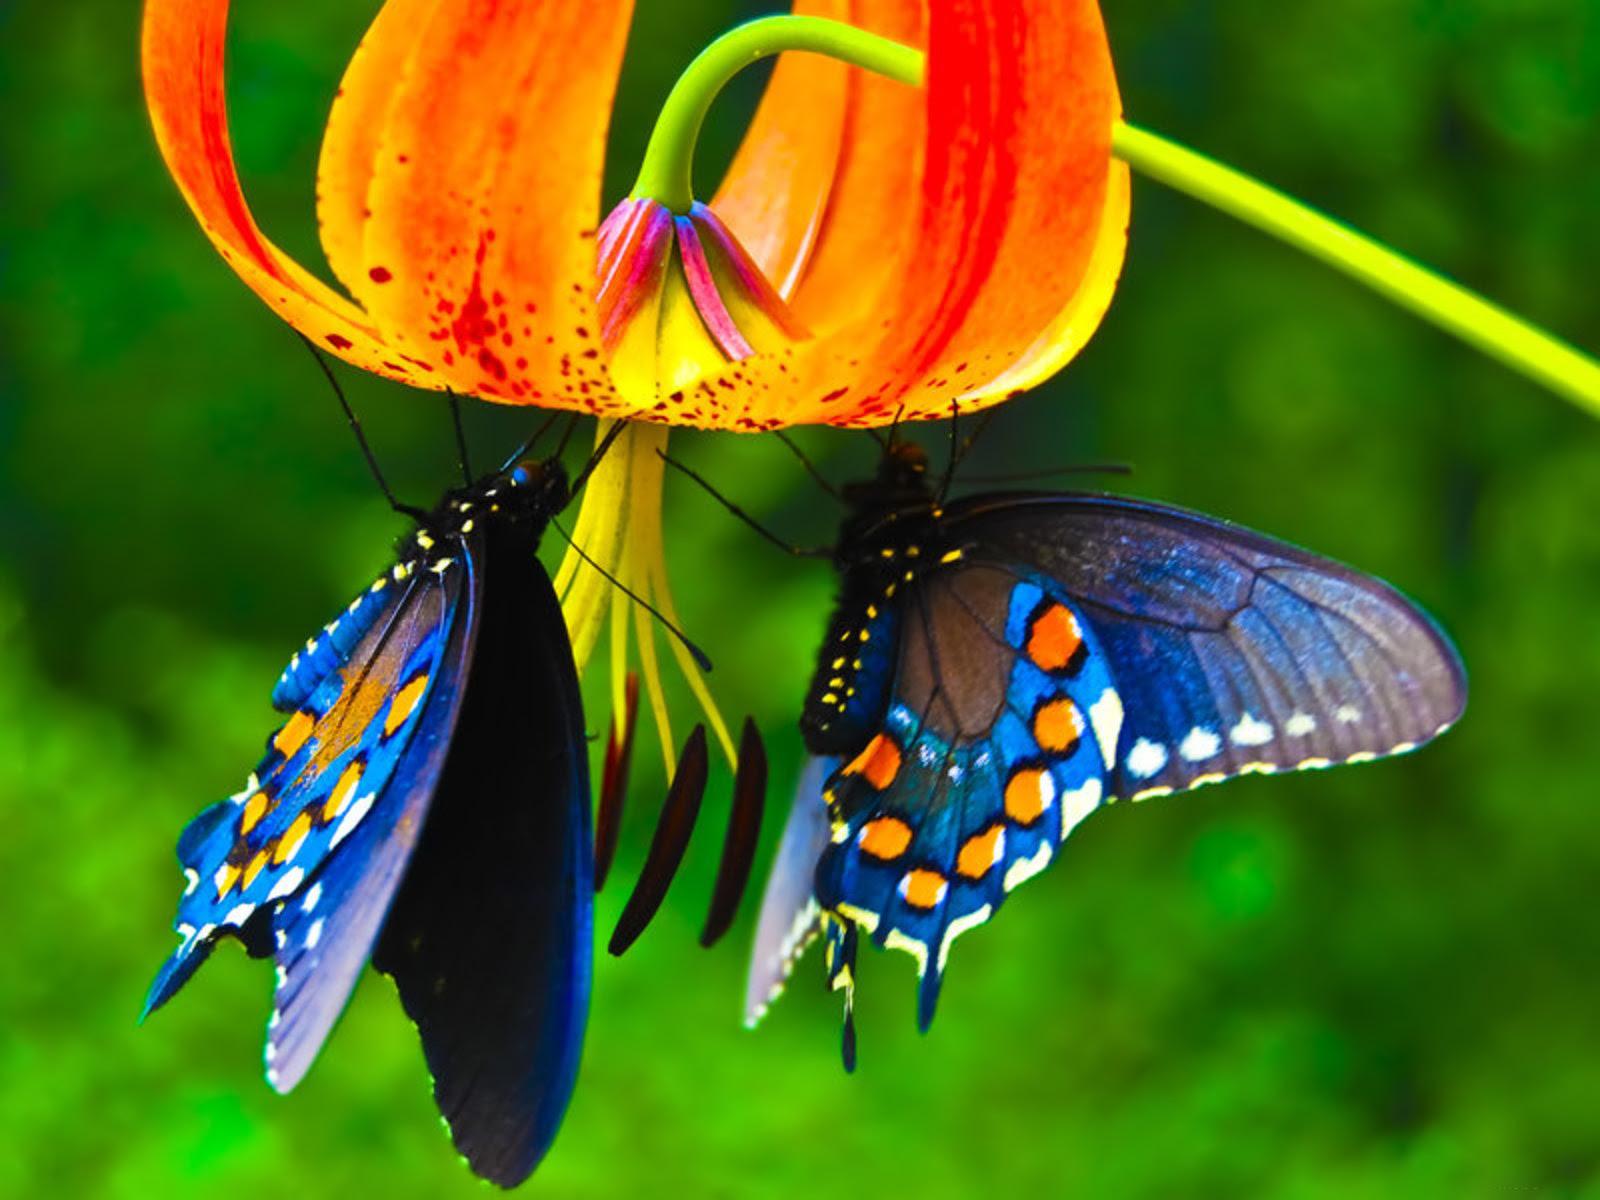 HD Butterfly Wallpapers, Butterflies Hd Wallpaper, #26861